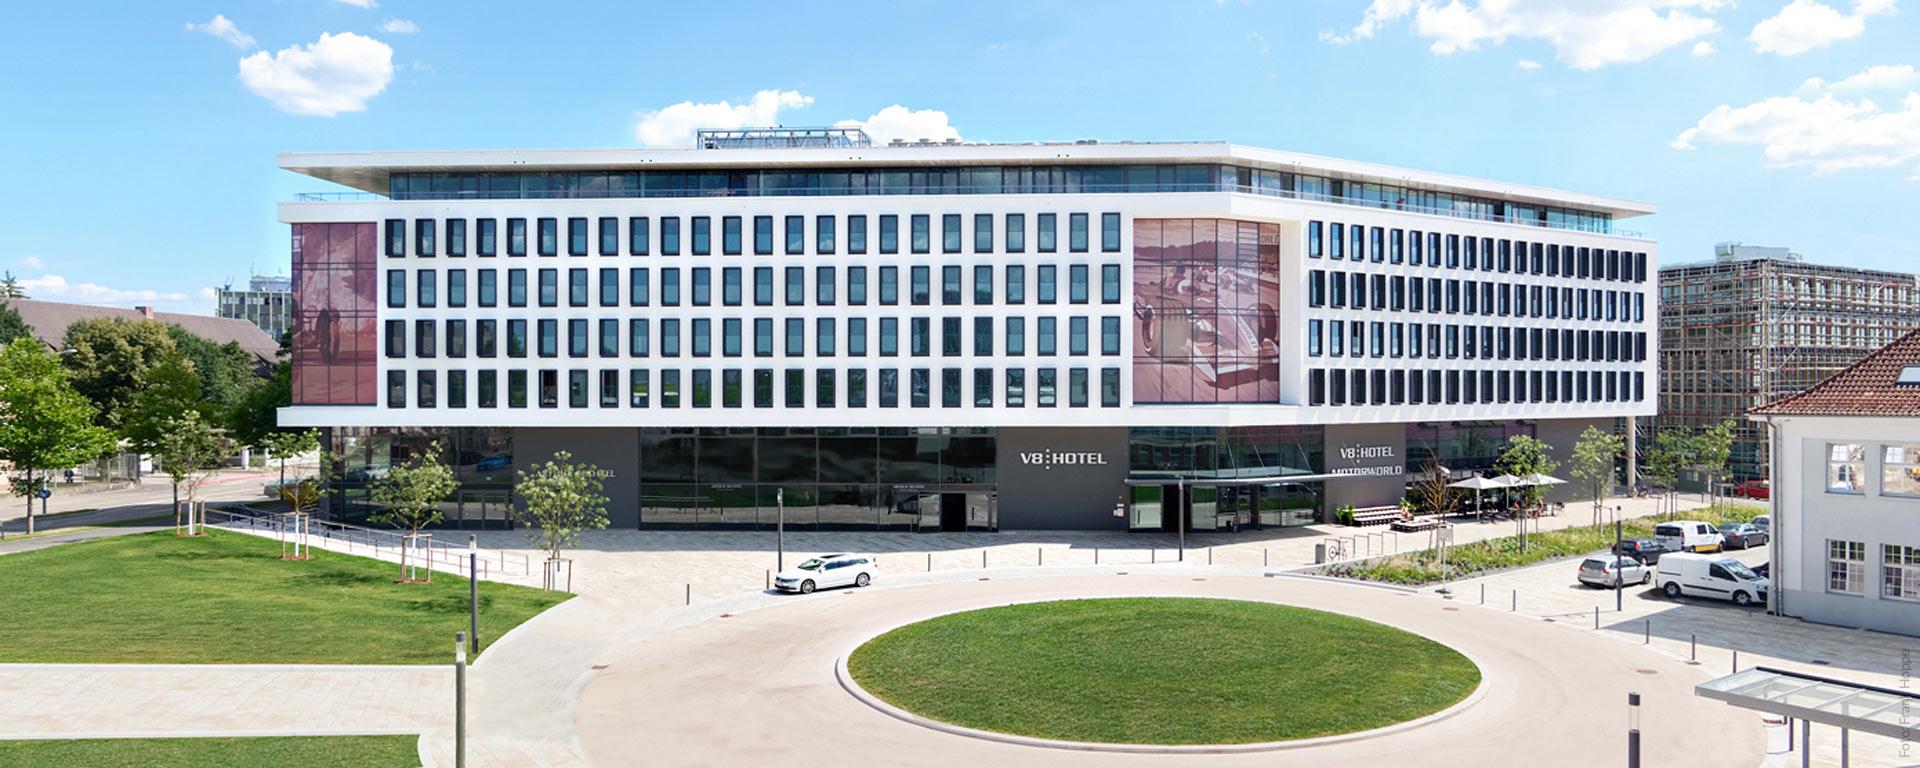 V8 HOTEL & V8 HOTEL CLASSIC MOTORWORLD REGION STUTTGART: Das Automobile vier Sterne Superior Themenhotel / Designhotel in Böblingen (BB) Flugfeld